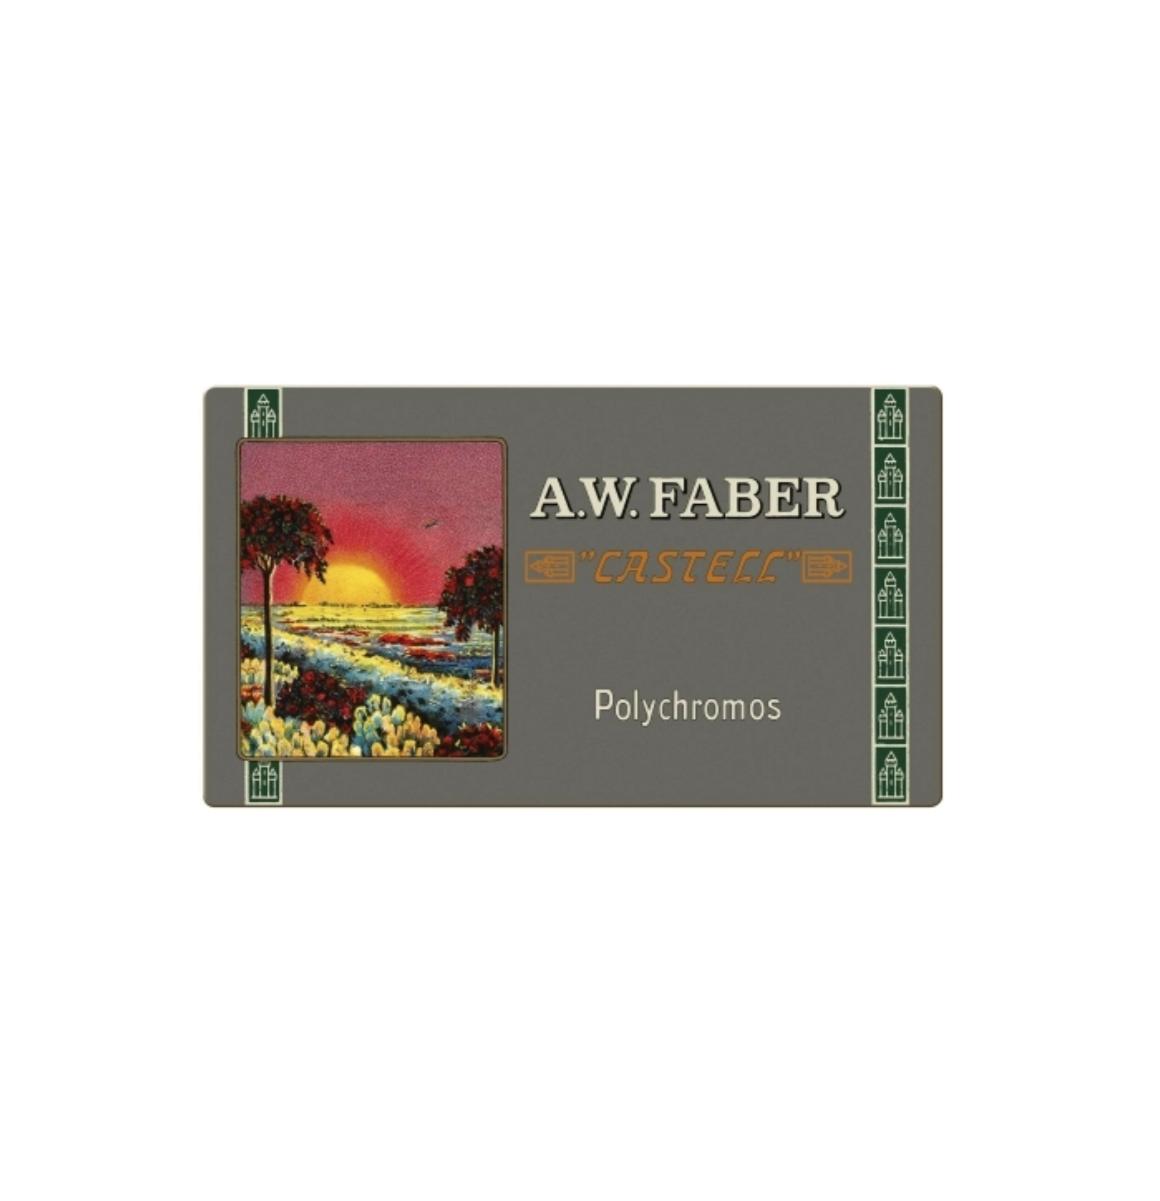 A.W. FABER CASTELL 36 POLYCHROMOS PENCILS CRAYON COULEUR ART ARTISTE DESSIN DRAW 4005402110032 COMASOUND KARTEL CSK ONLINE